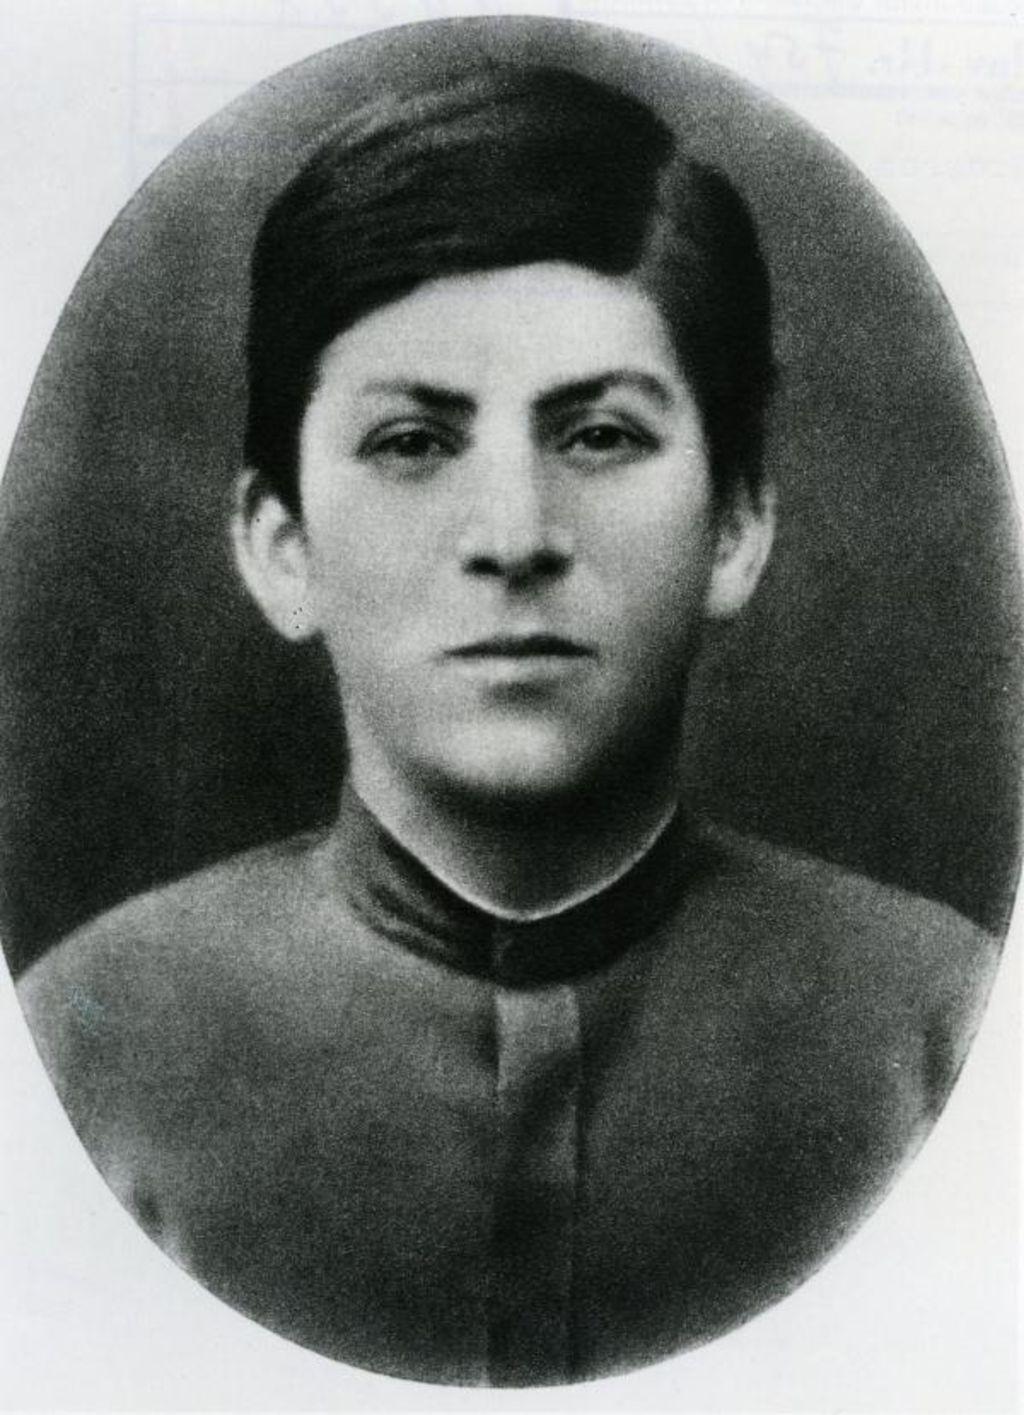 josef w stalin 1893 - Wolfgang Schuble Lebenslauf